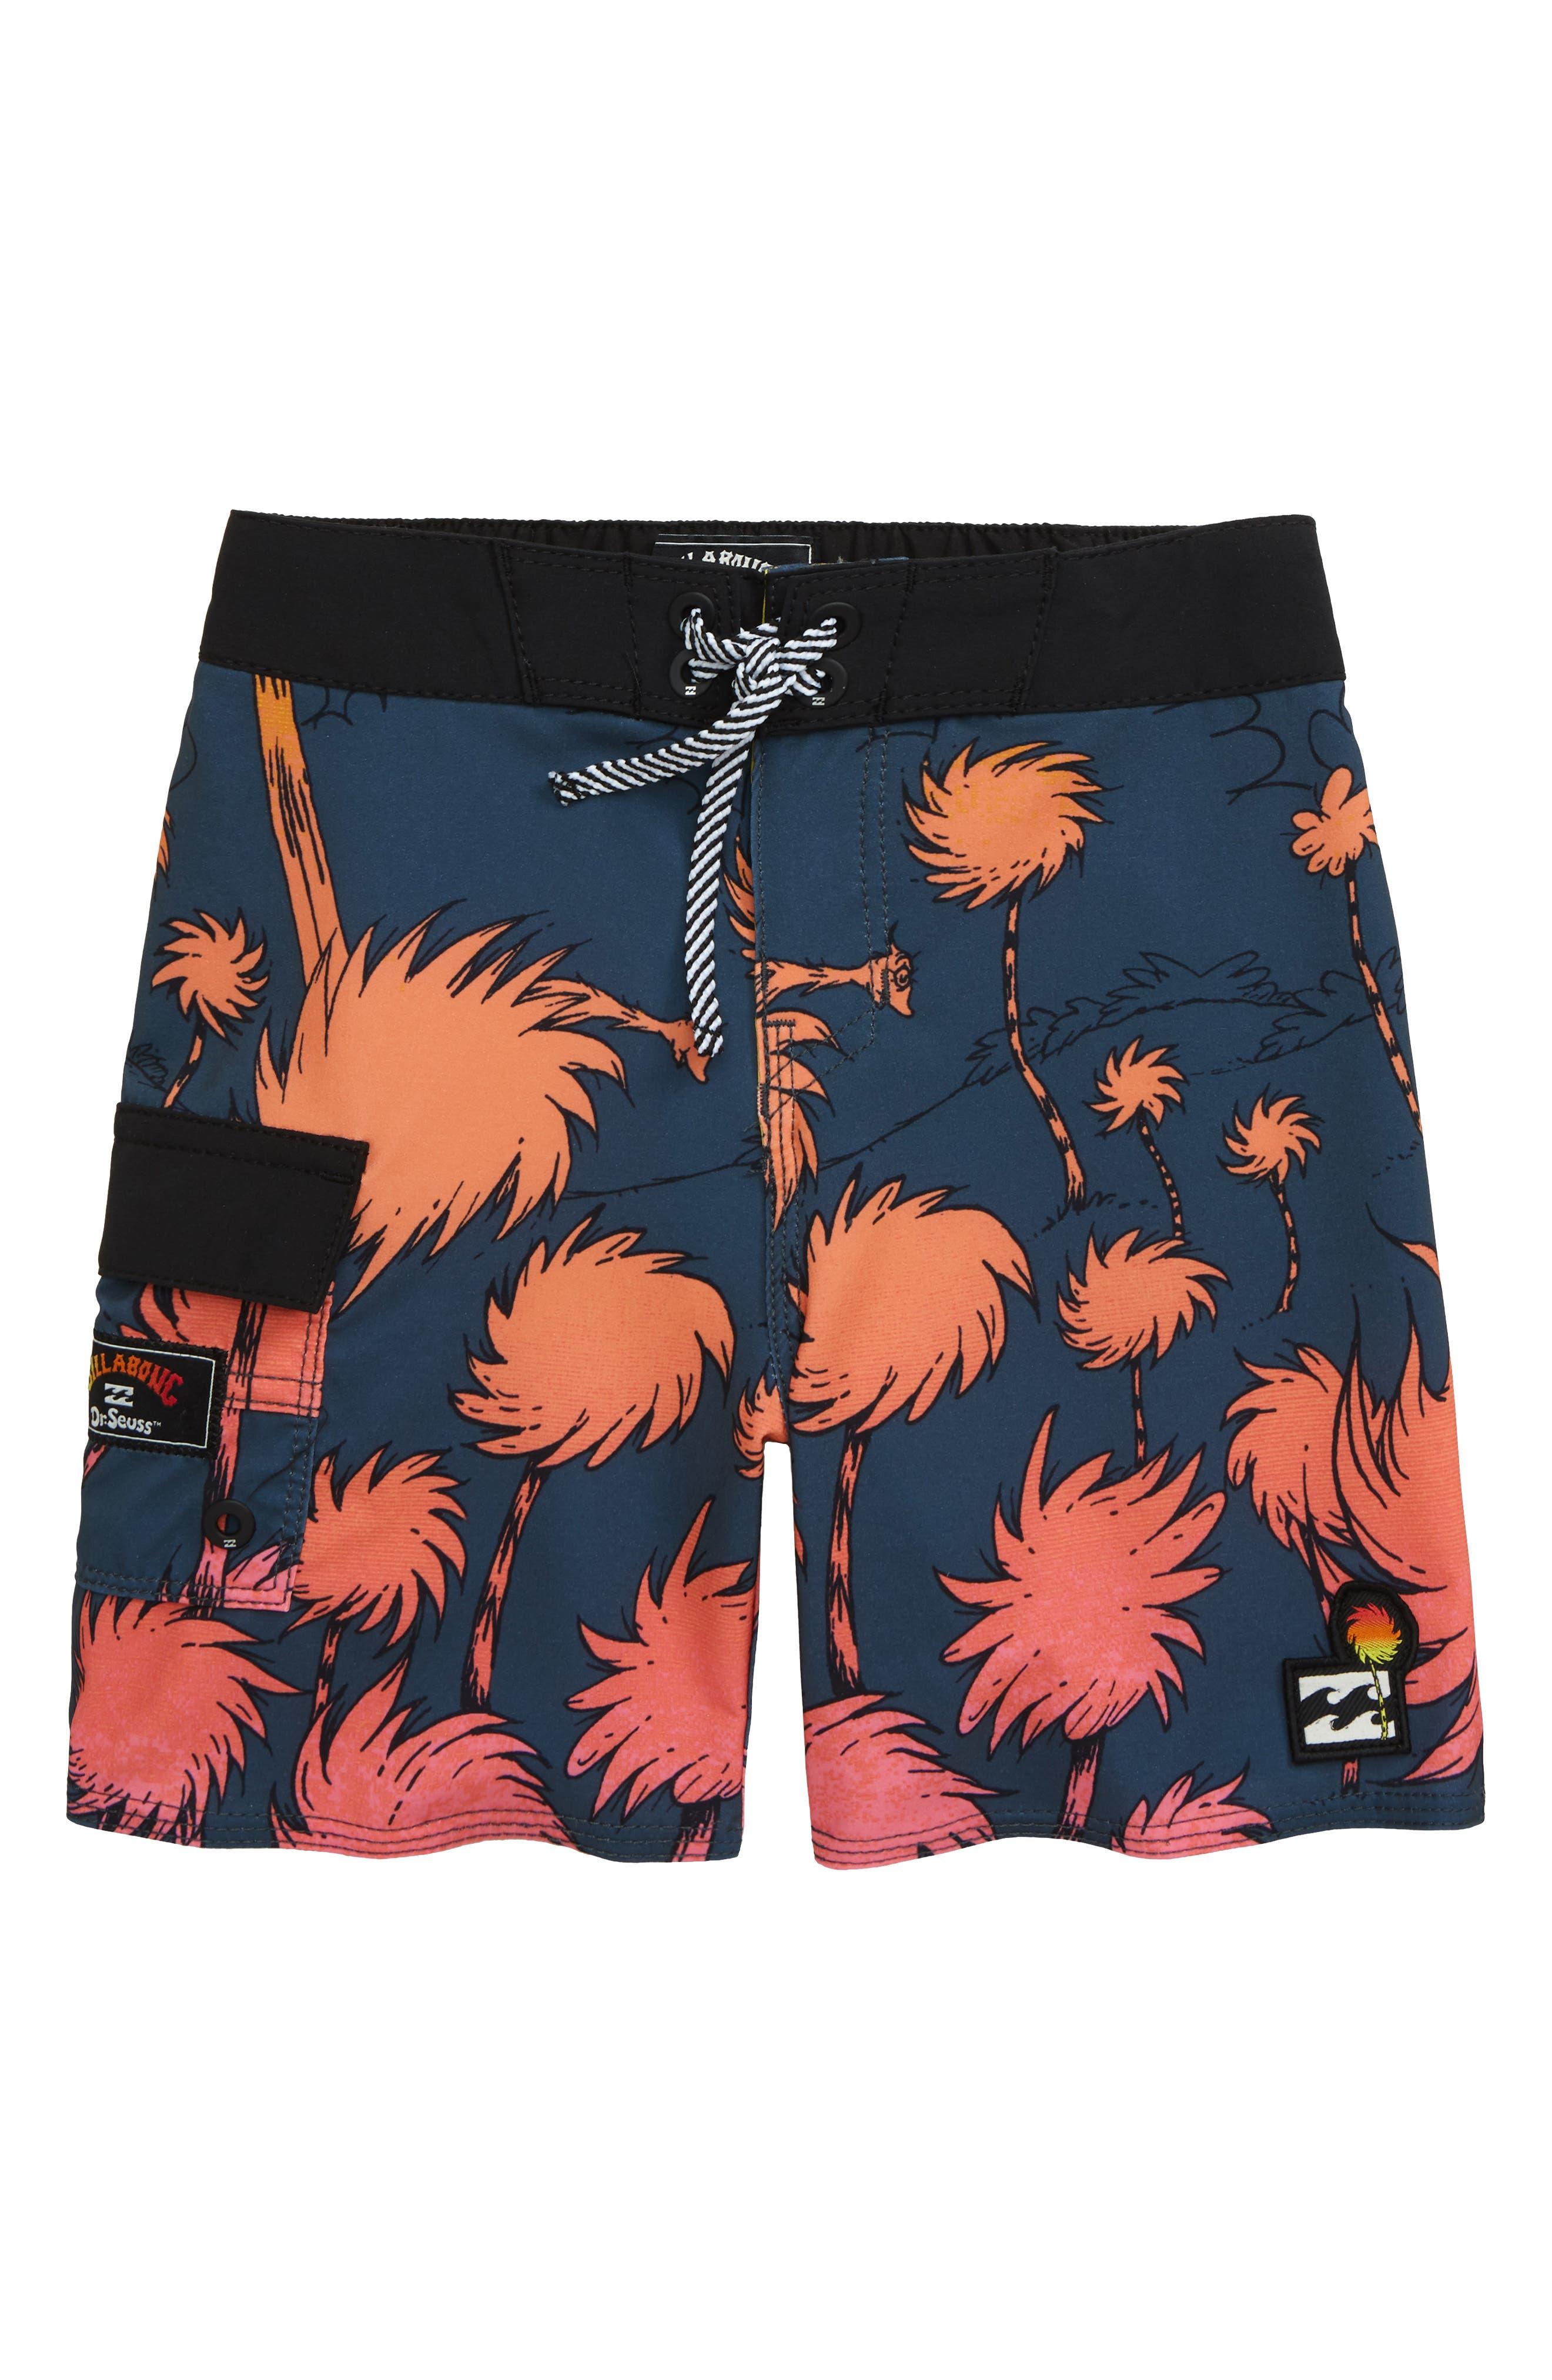 Kidhome Teenagers Boys Beach Board Shorts Sea Turtle Summer Drawstring Beach Shorts Swim Trunks with Pockets for Teen Boys